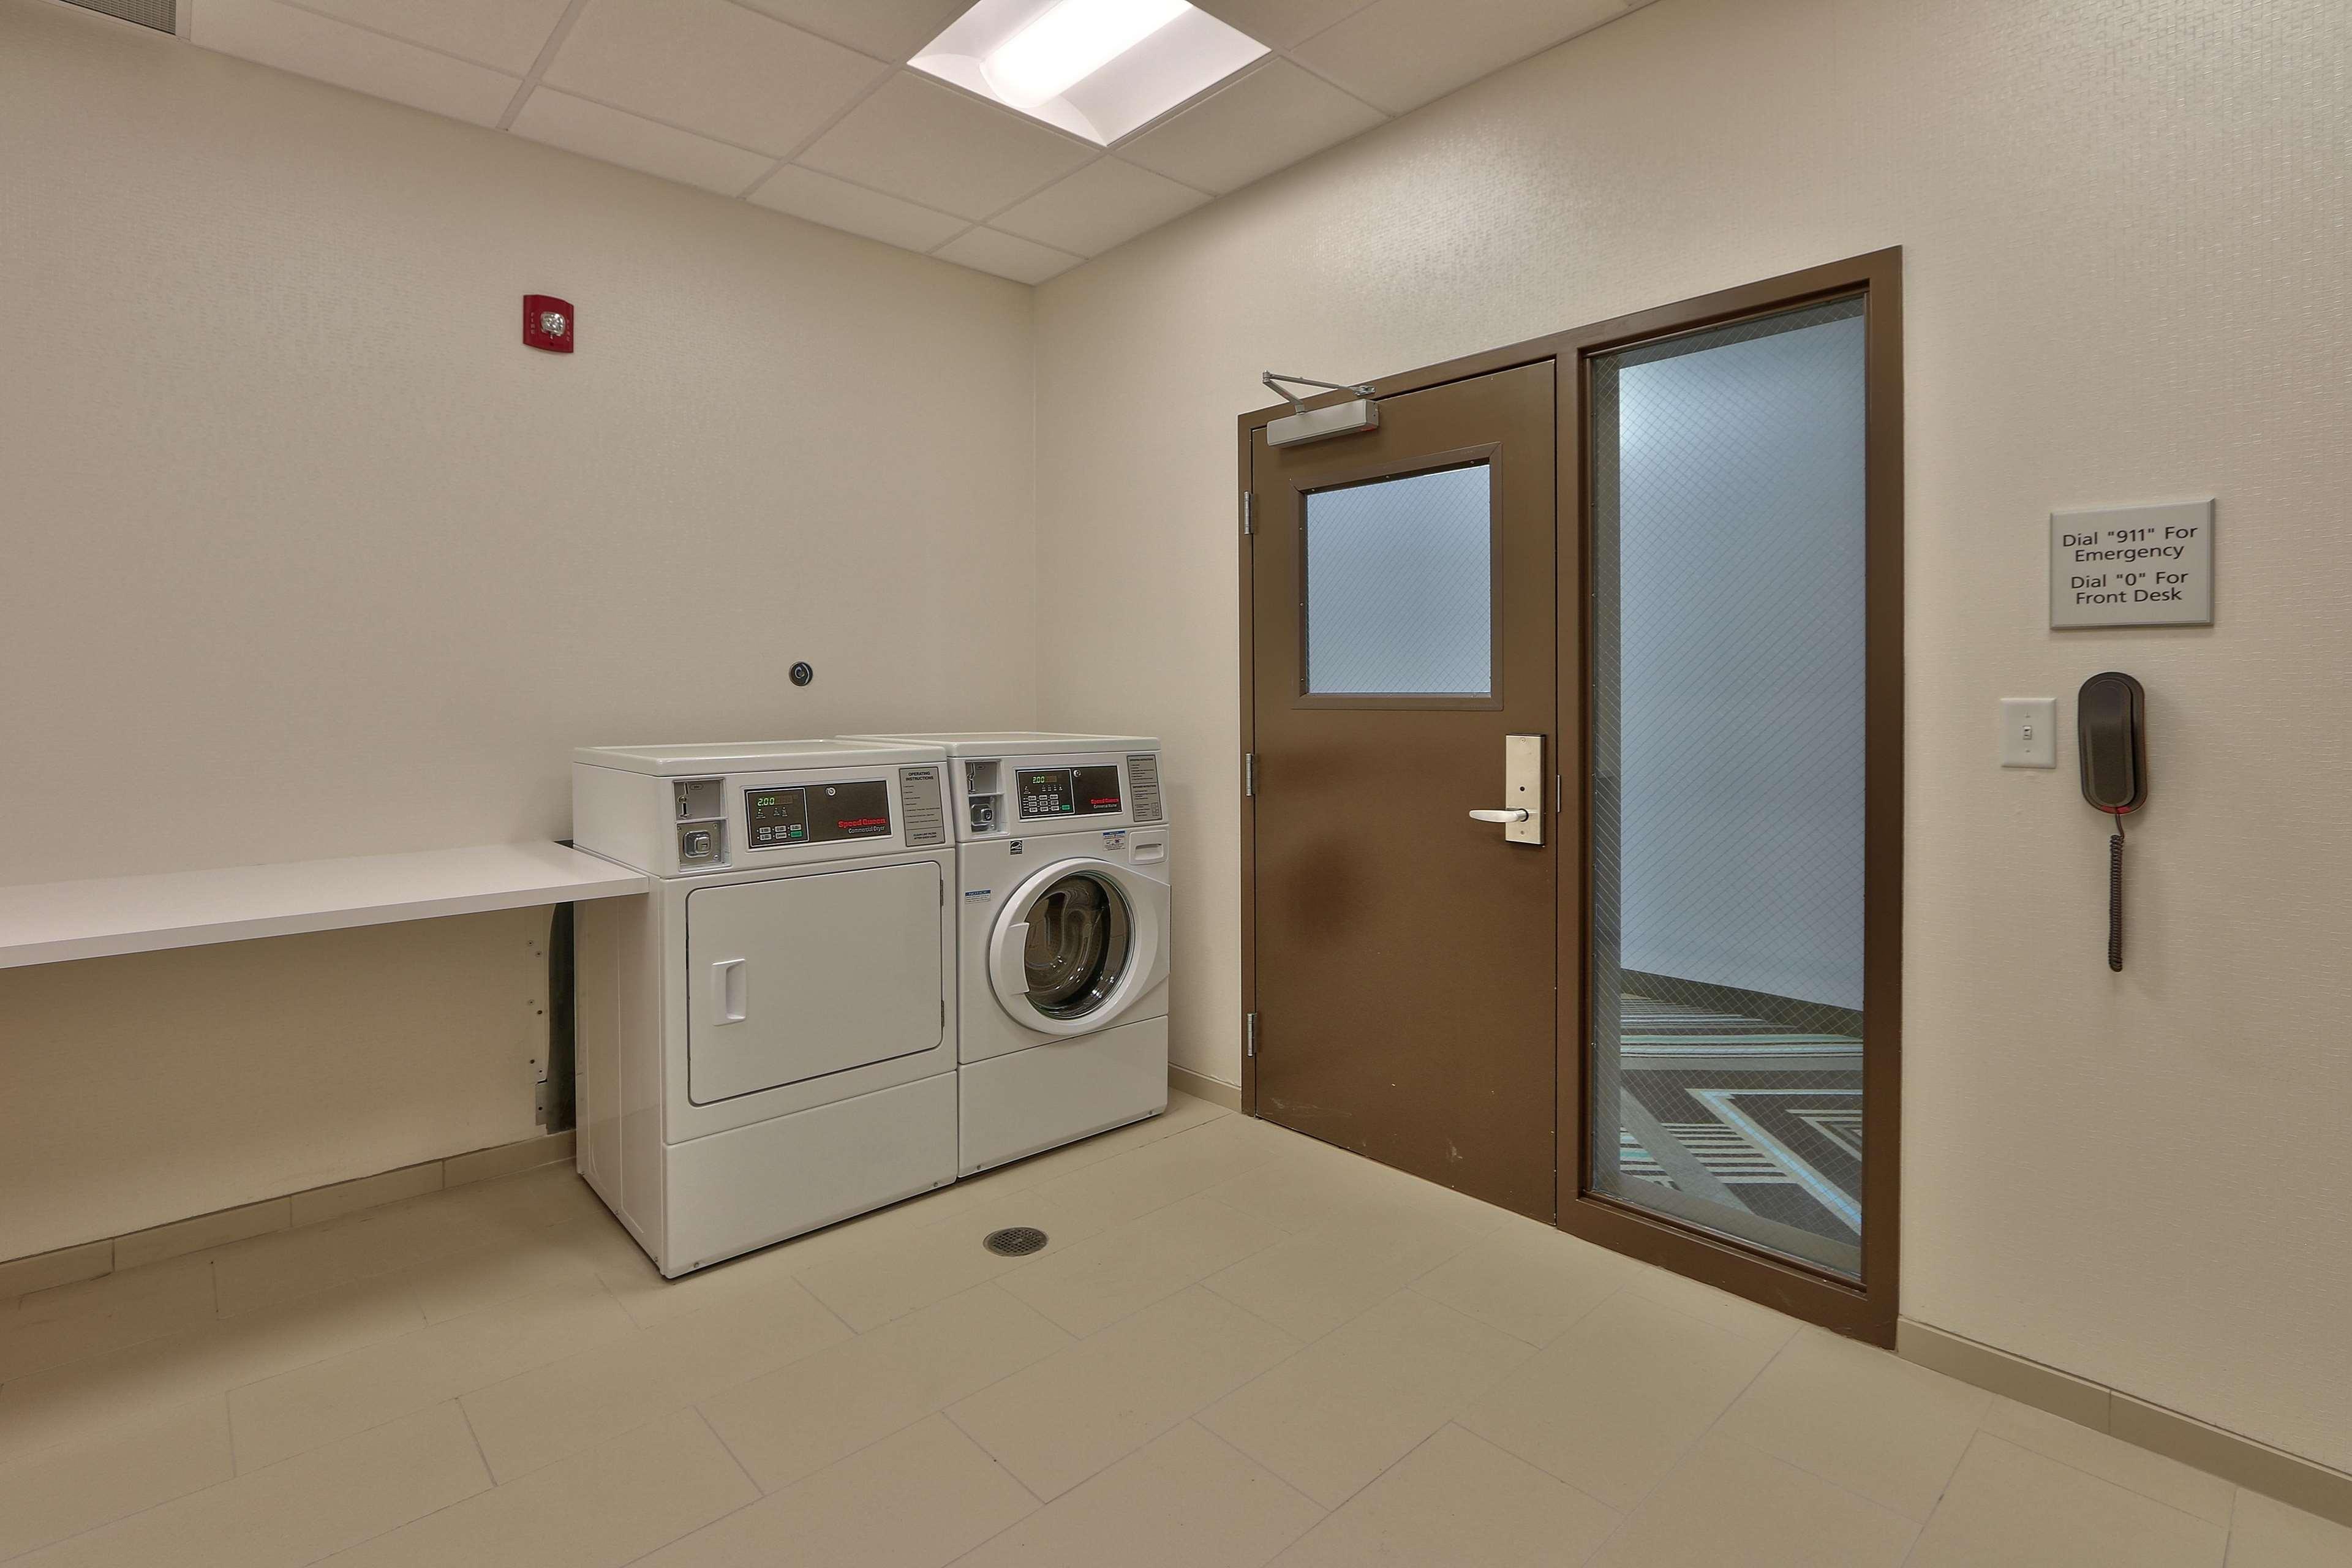 Hampton Inn & Suites Artesia image 22